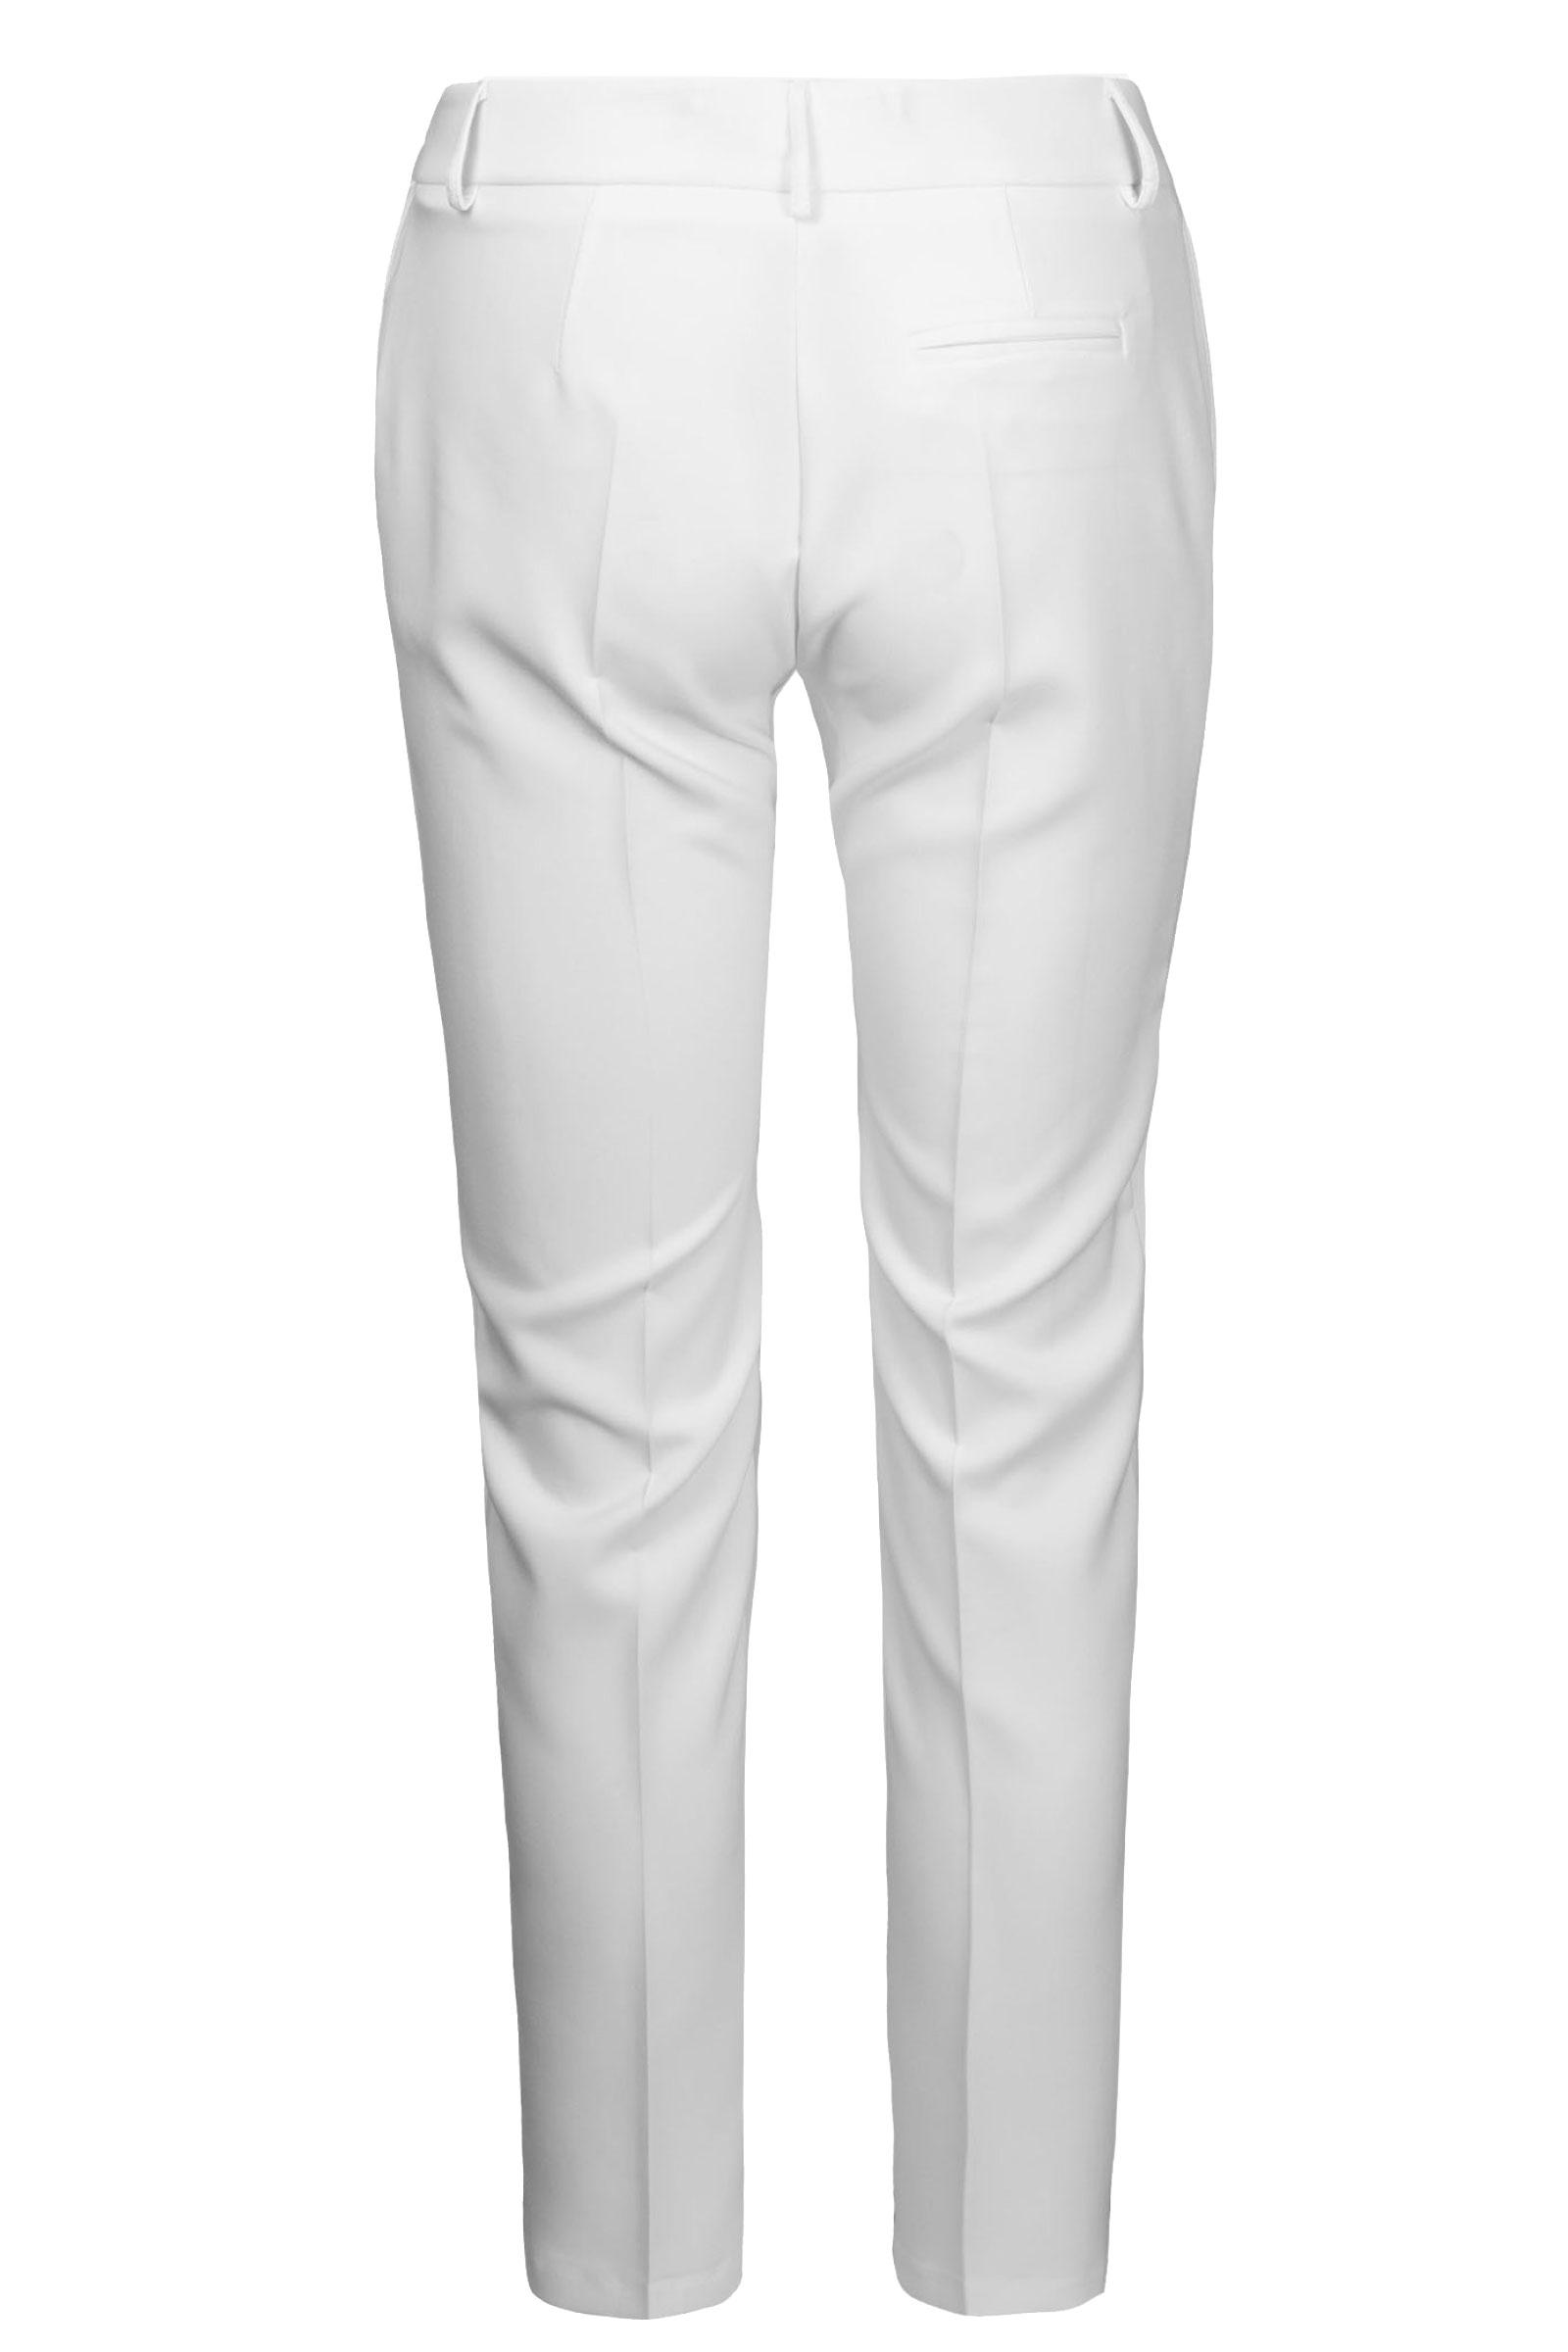 RINASCIMENTO Pantalone Donna RINASCIMENTO   Pantalone   CFC0102428003B021